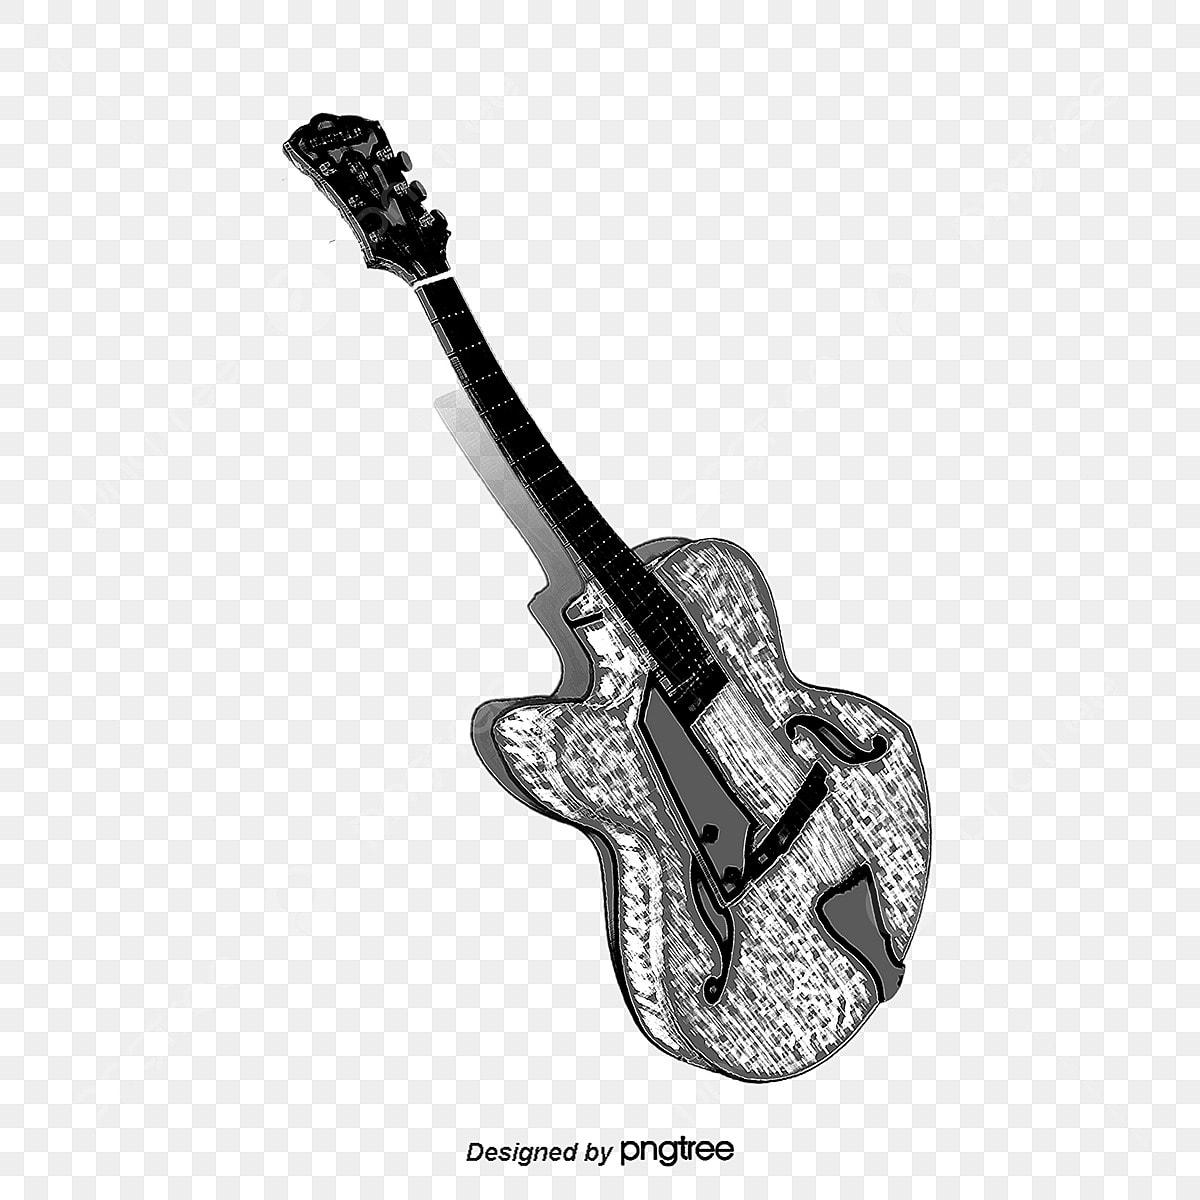 Desenho De Guitarra Guitarra Desenho De Guitarra Instrumentos